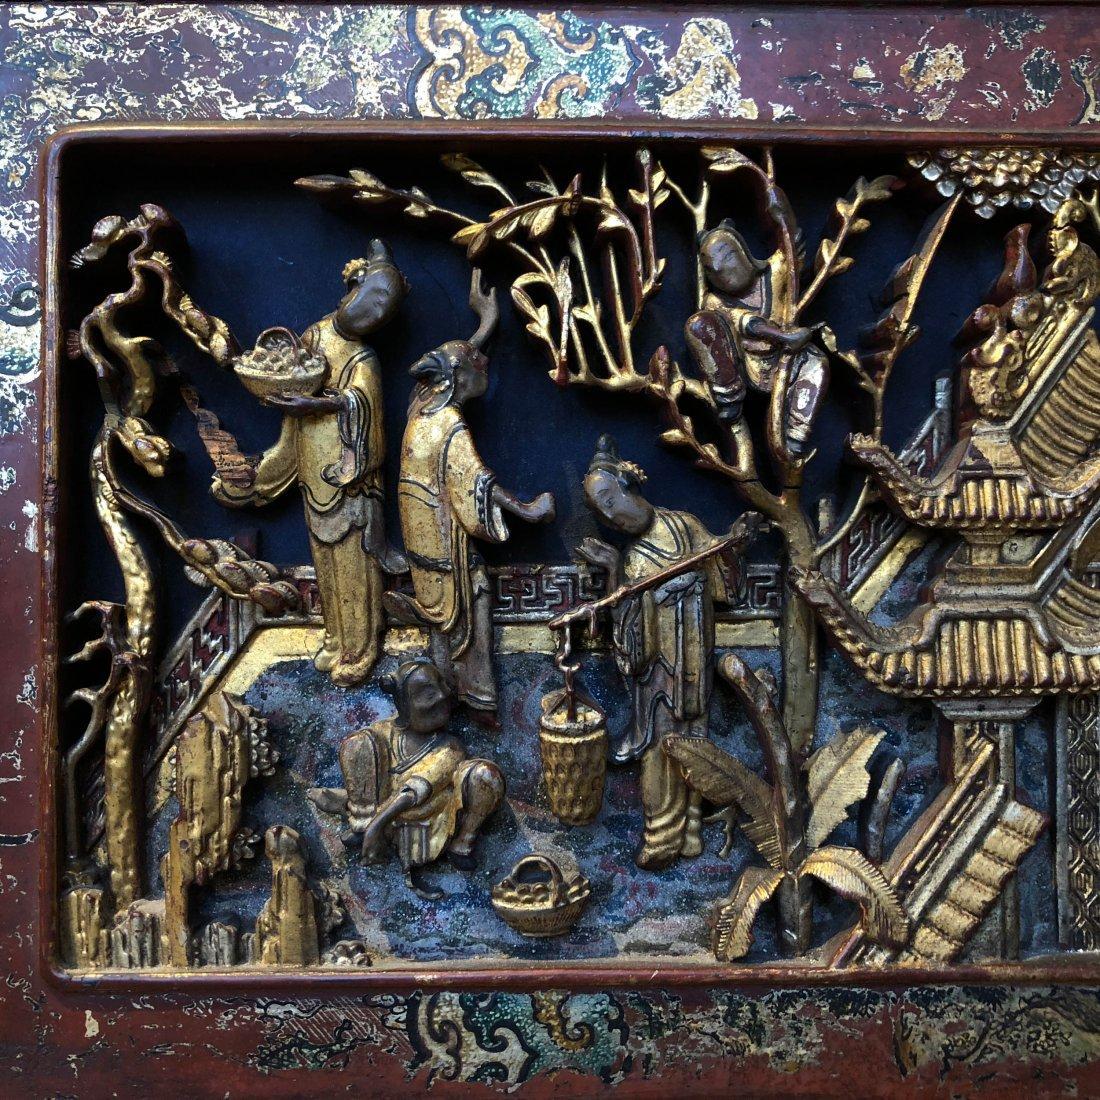 Antique Chinese Gilt & Hardwood Carved Cabinet - 10